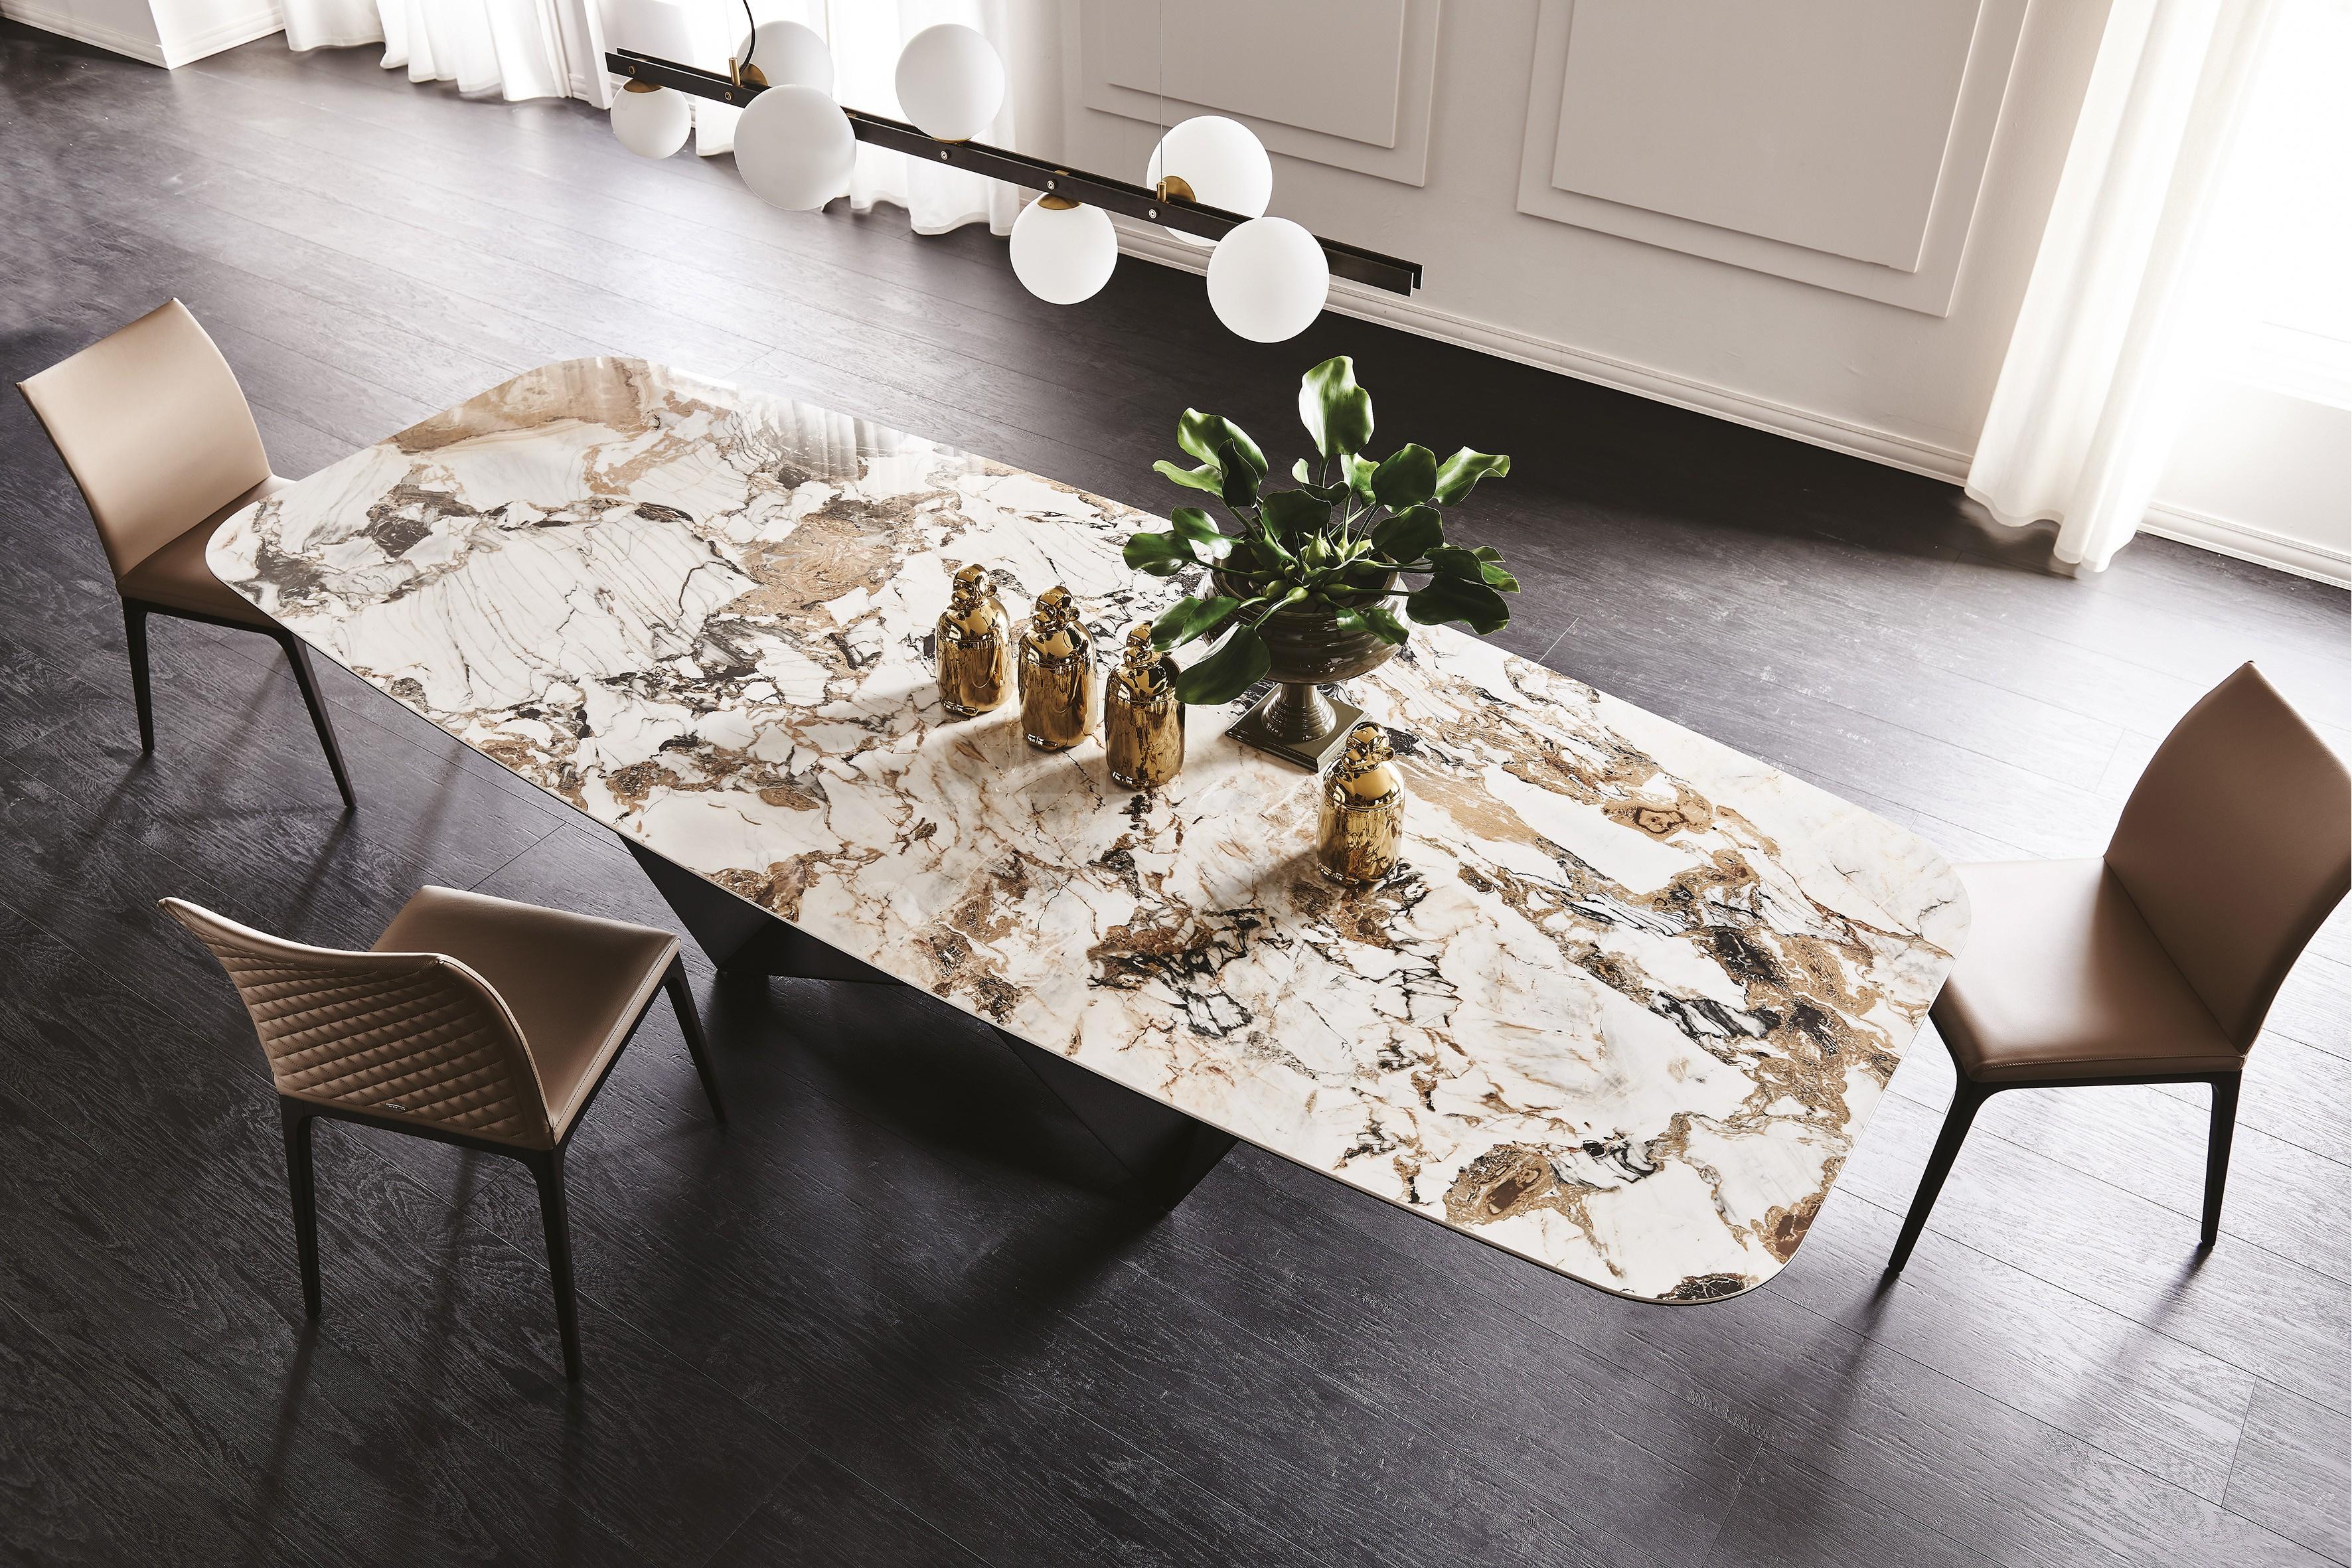 Skorpio Keramik Dining Table